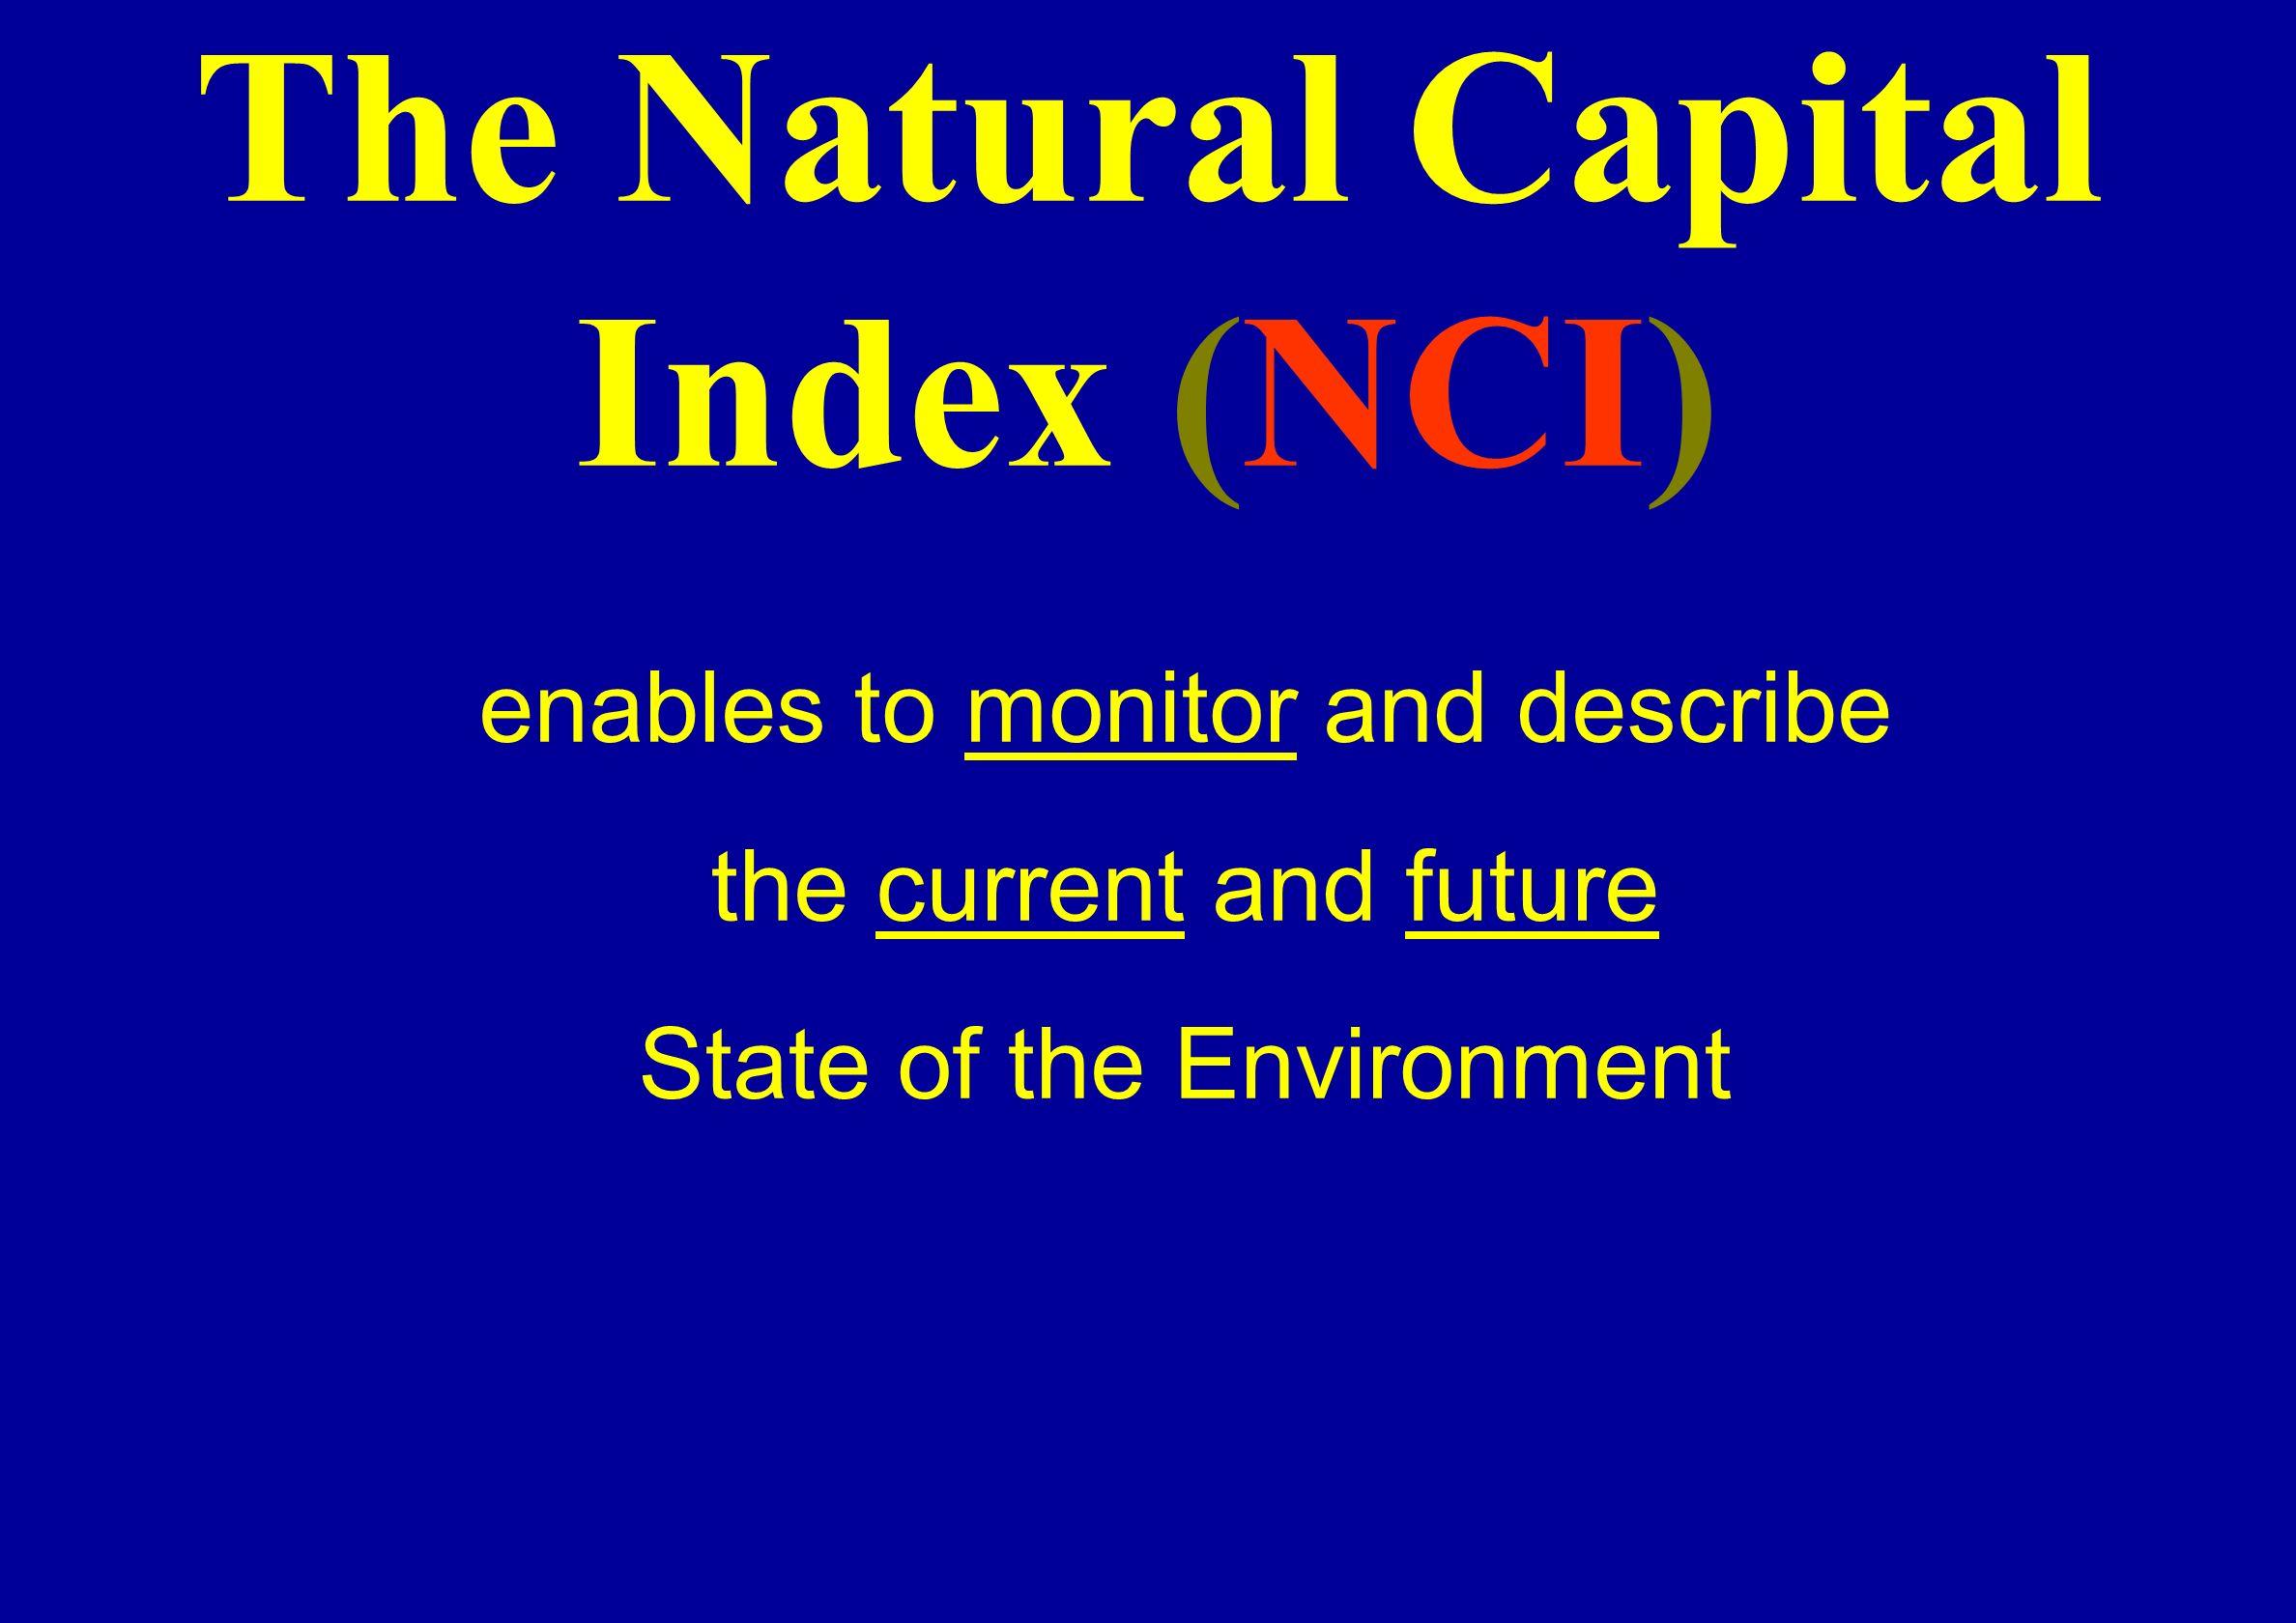 The Natural Capital Index (NCI)